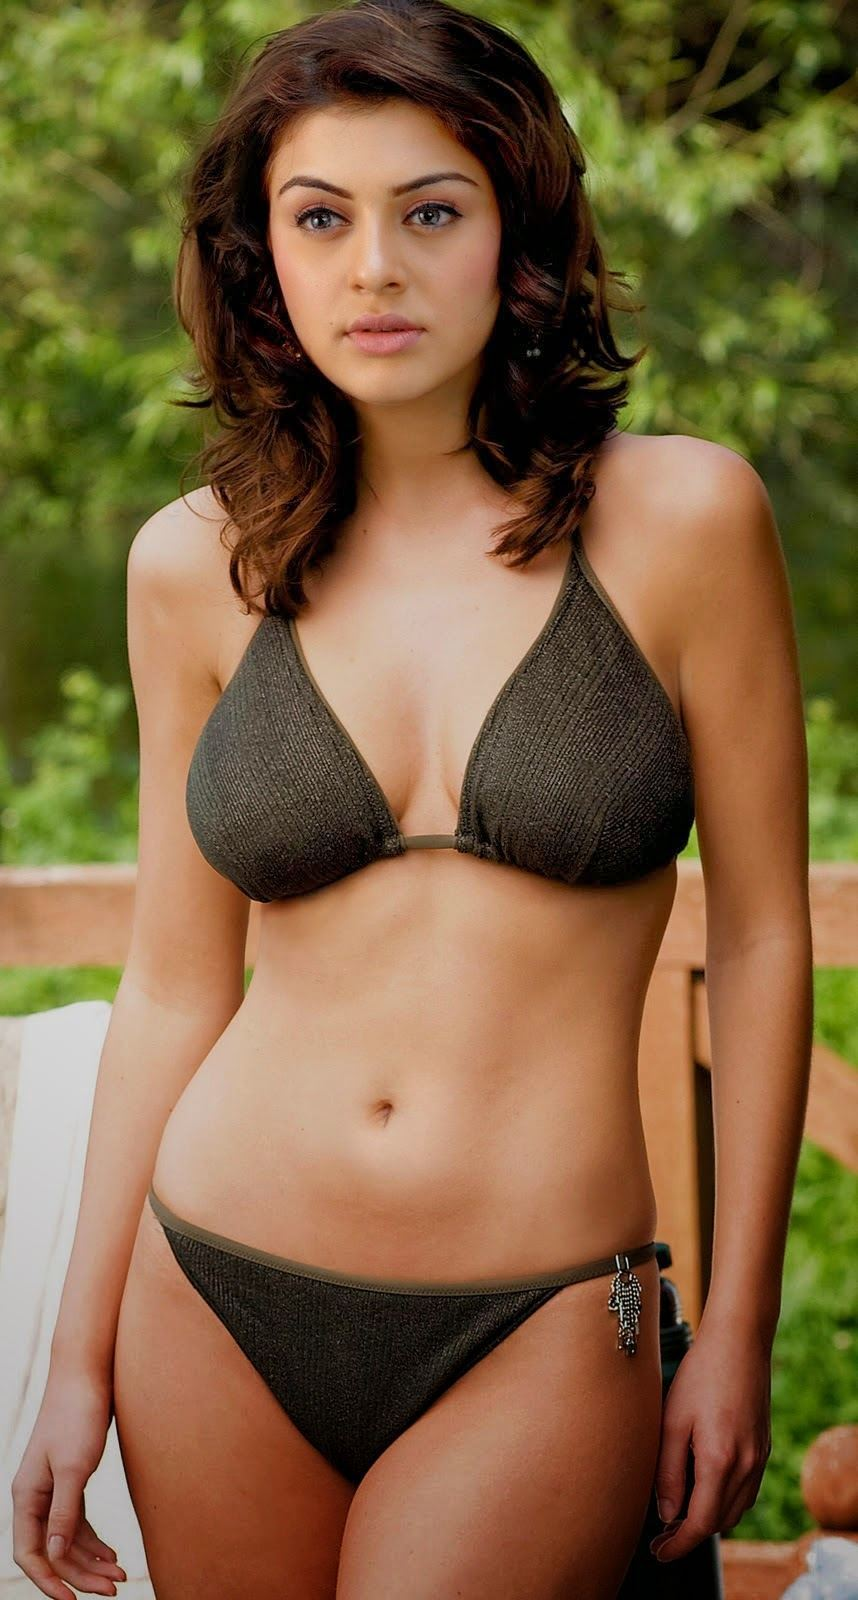 Gallery Selfie Allison Smith (actress)  nude (25 foto), Facebook, braless